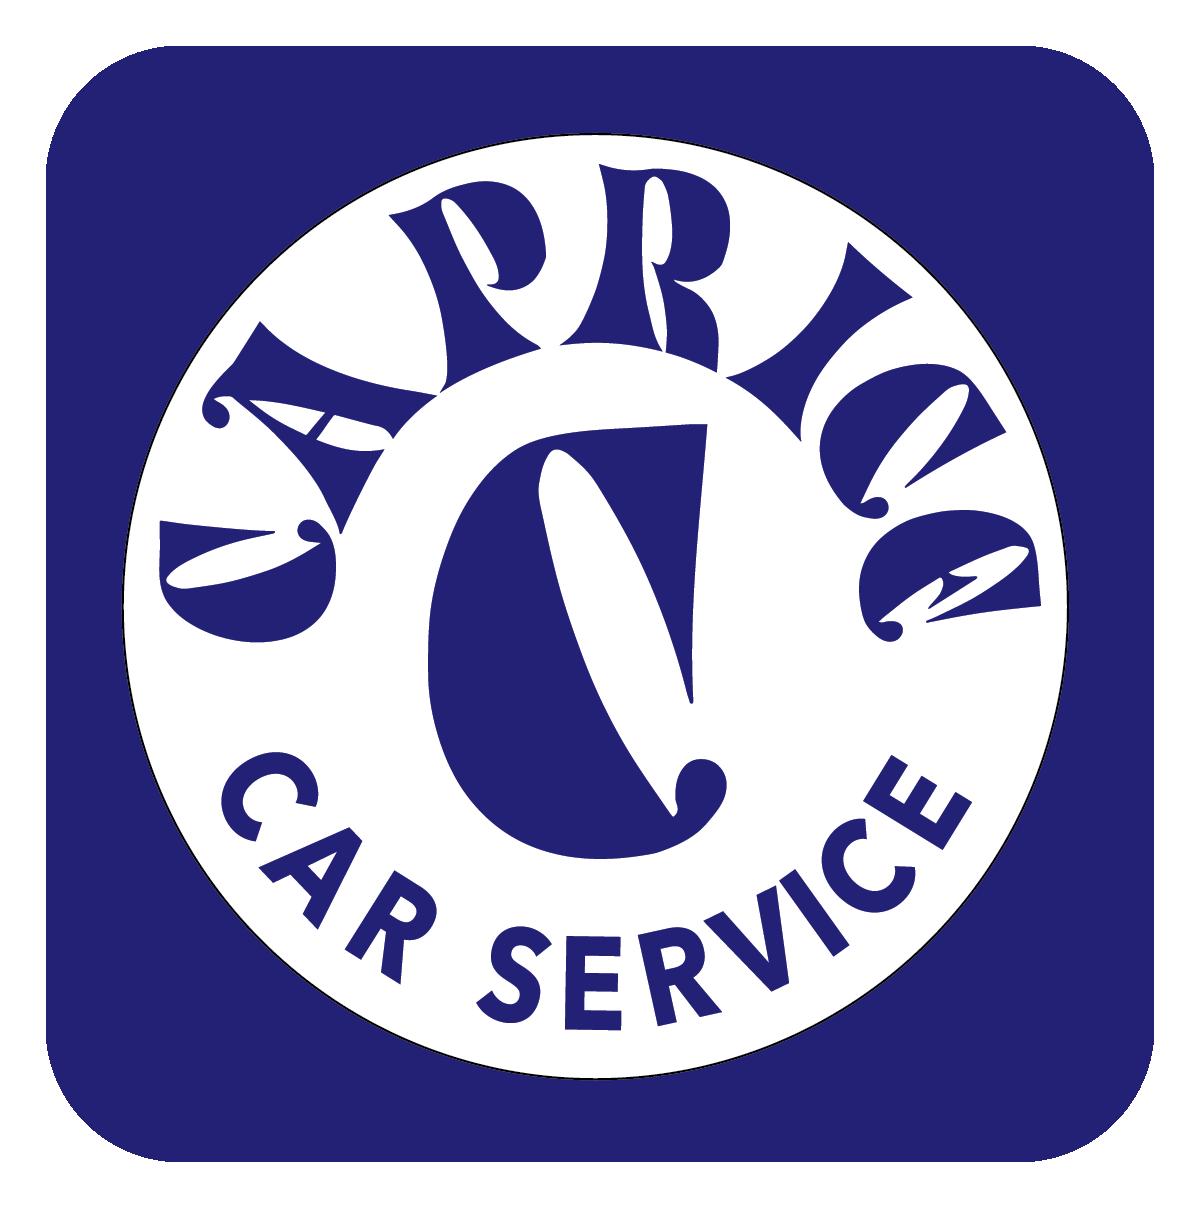 caprice car service  Caprice Car Service In Woodside   Flushing   Caprice Car Service